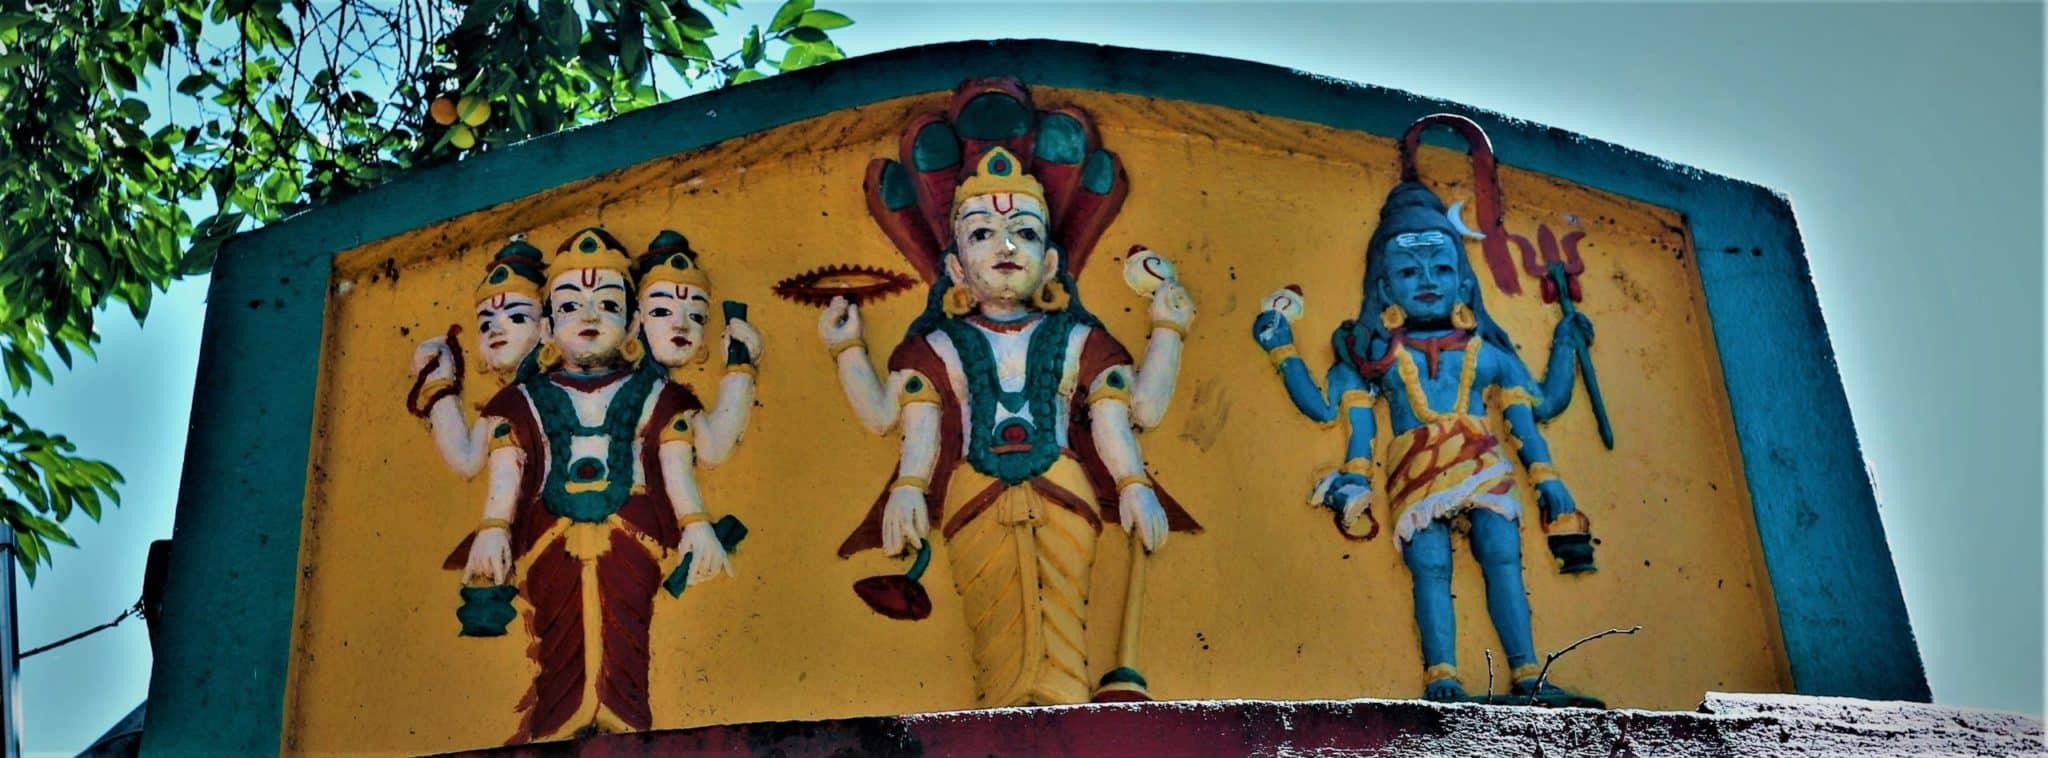 Hindouisme Brahma Vishnu Shiva